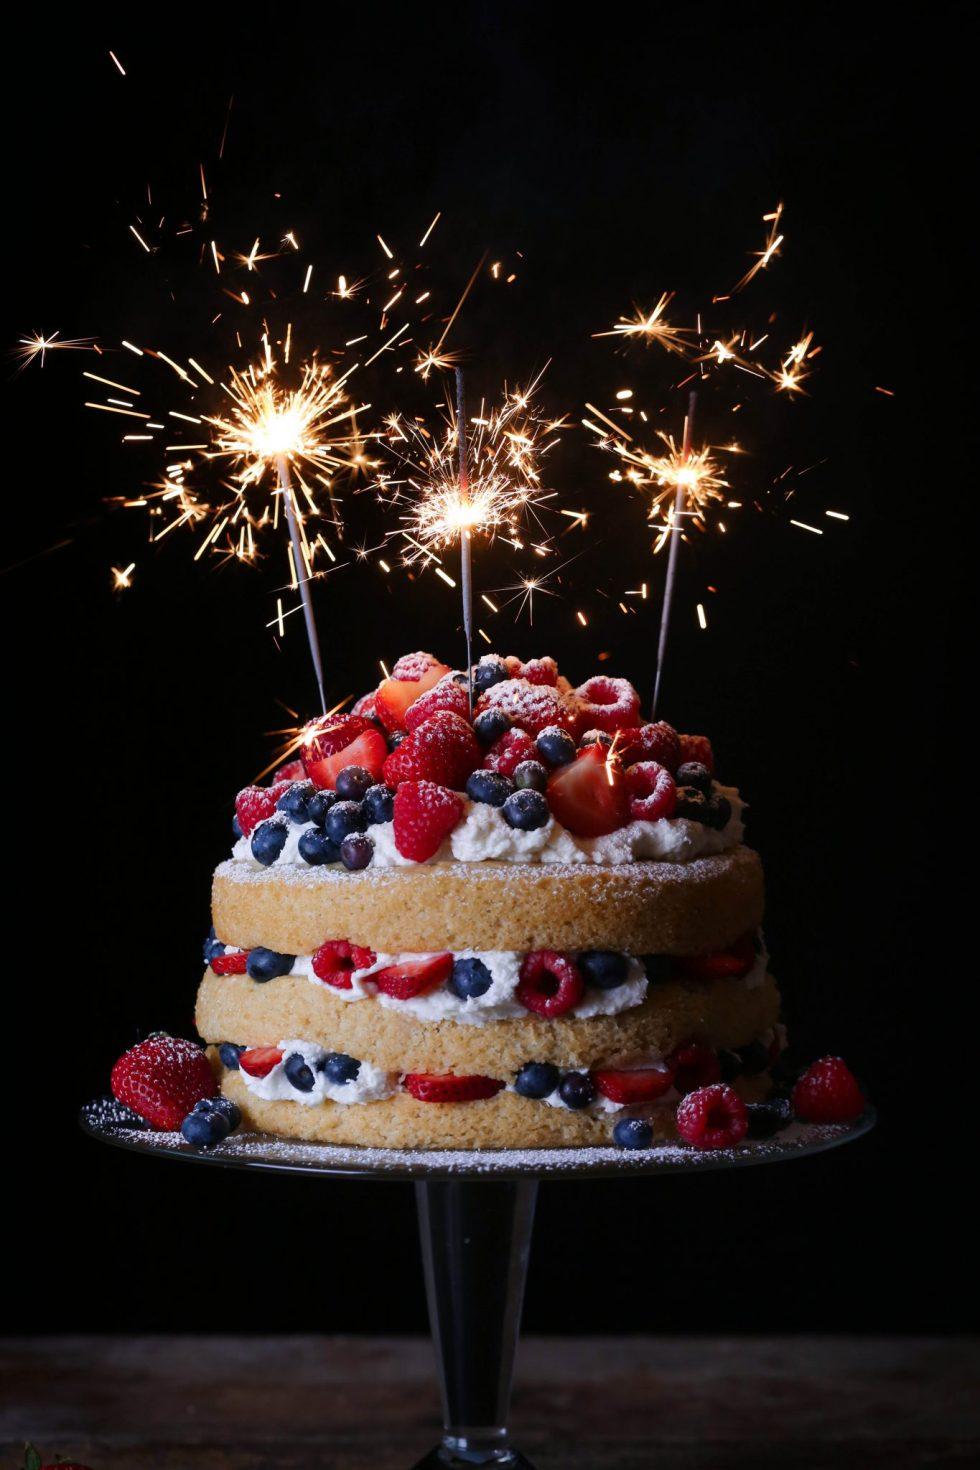 Vanilla Layer Cake with Fresh Berries | Vegan Friendly with Gluten-Free Option